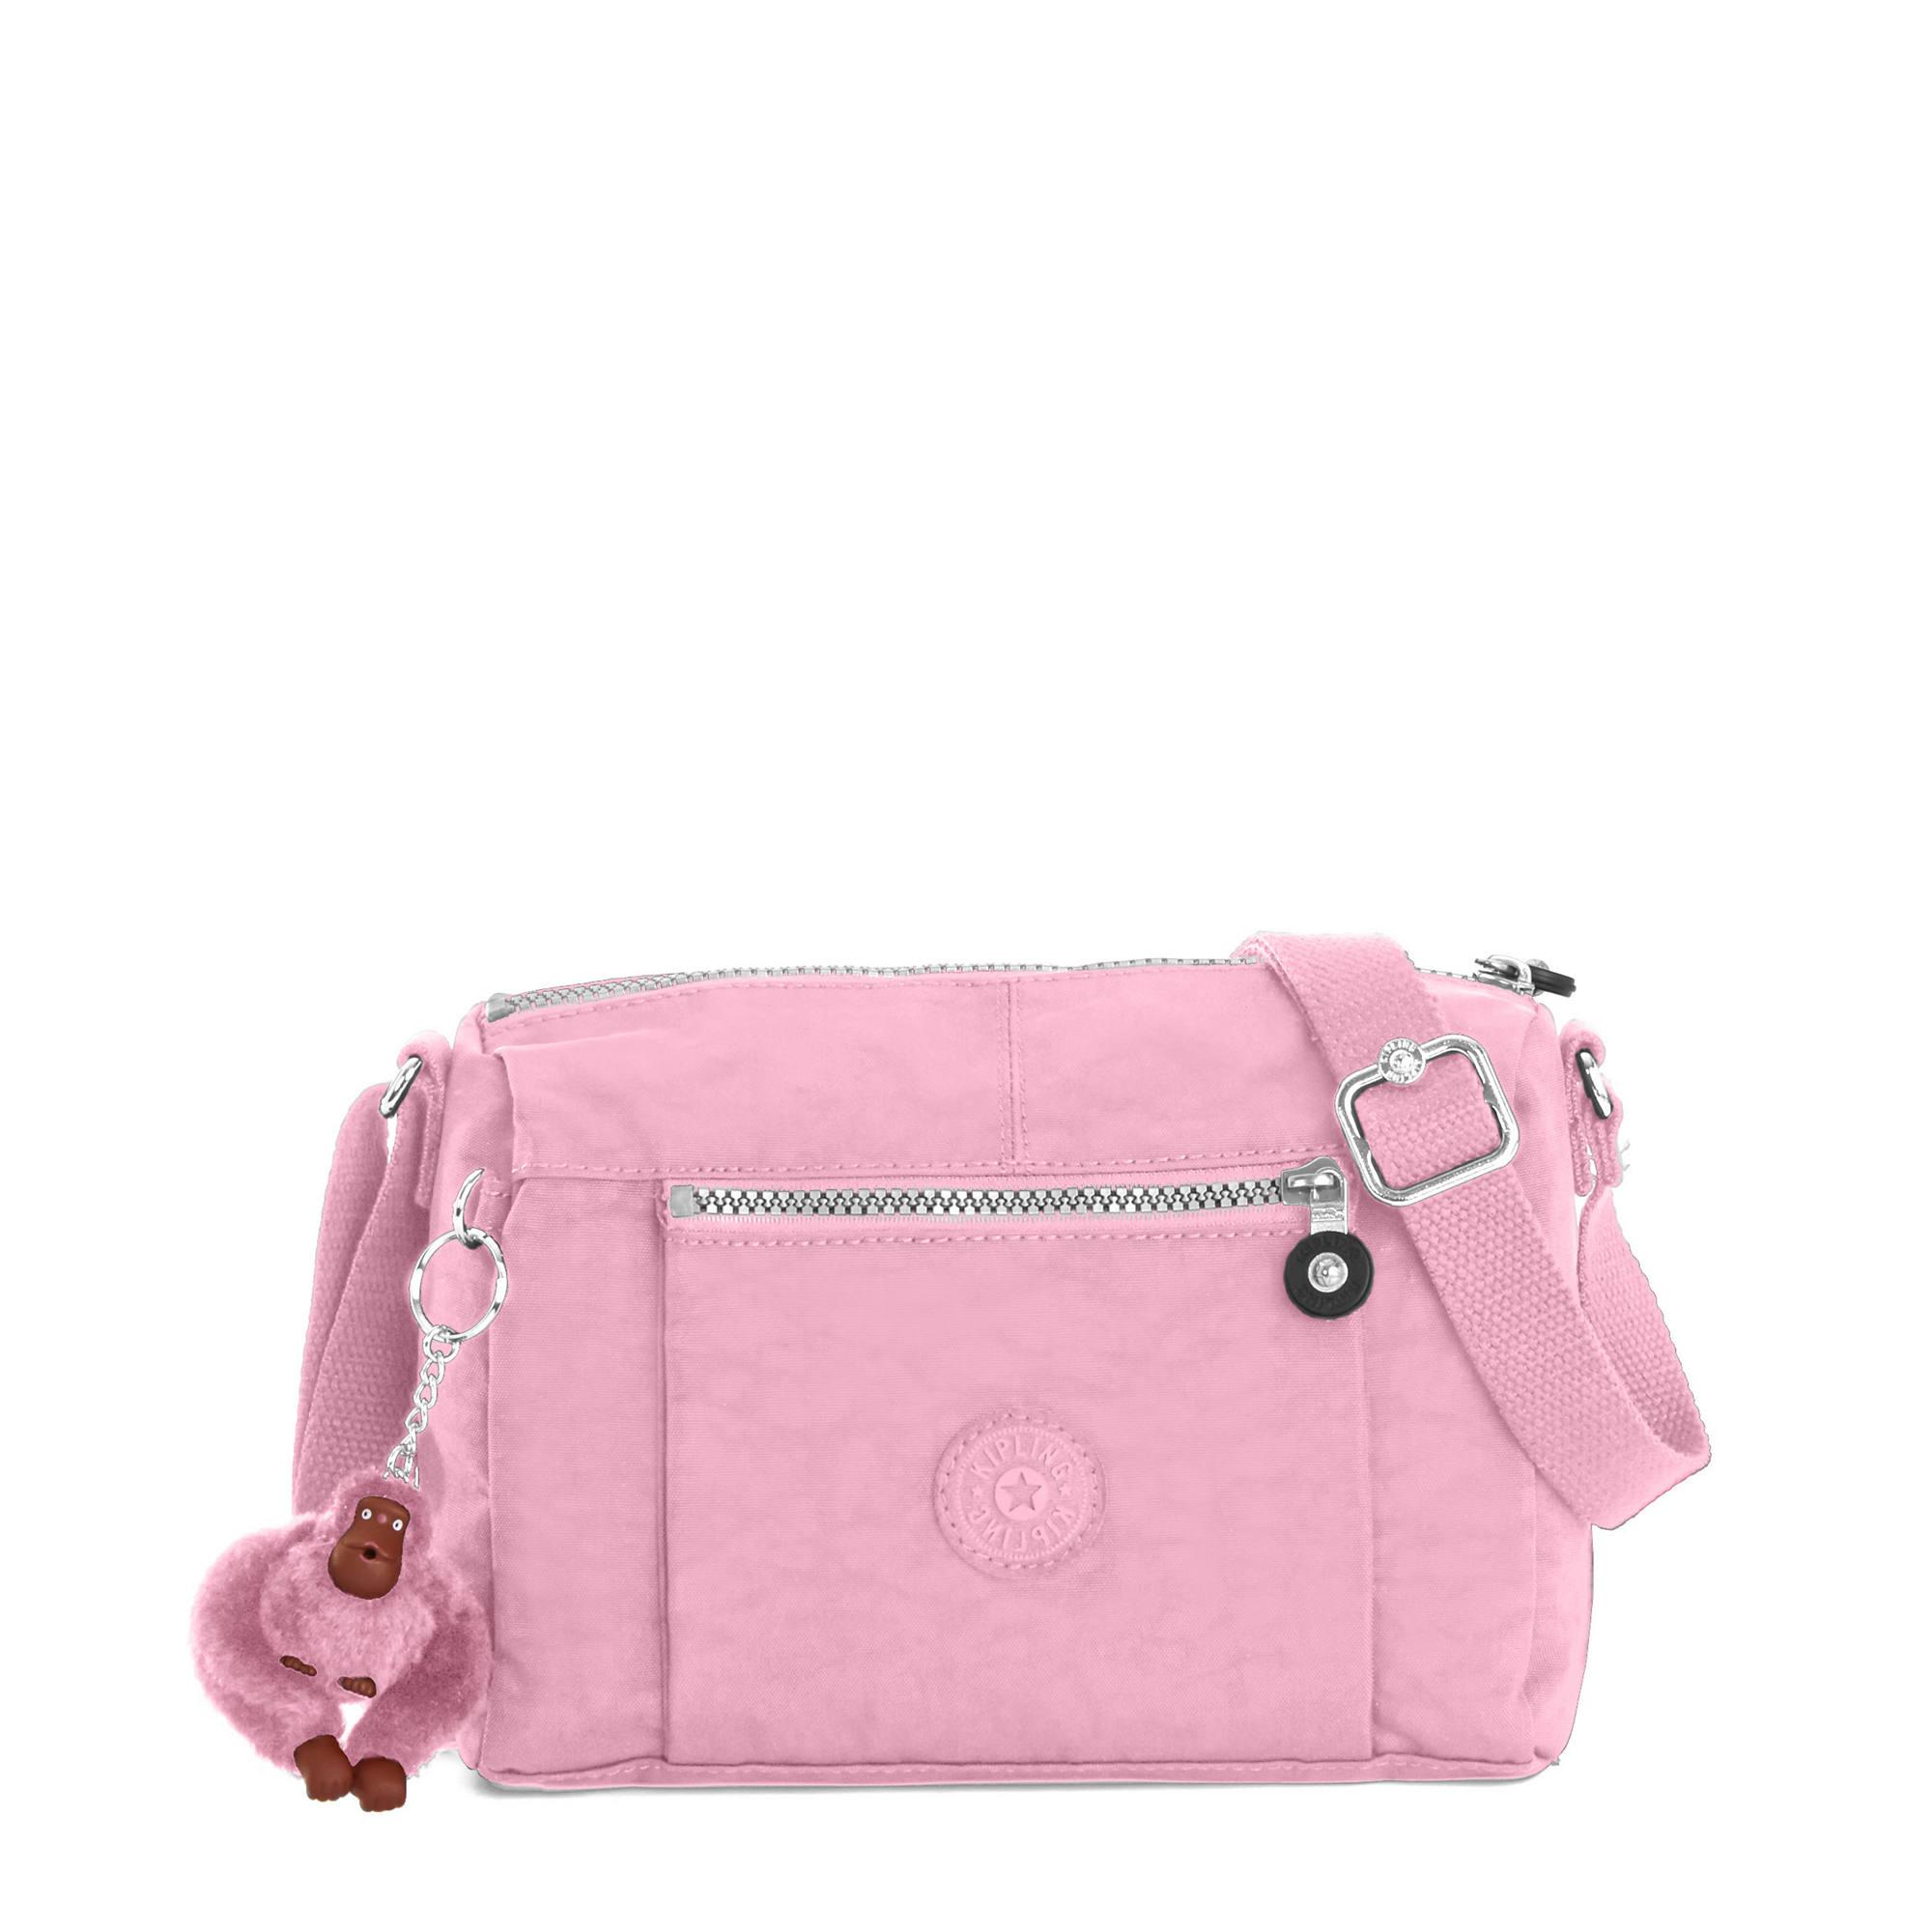 43003fa4c51 Wes Crossbody Bag